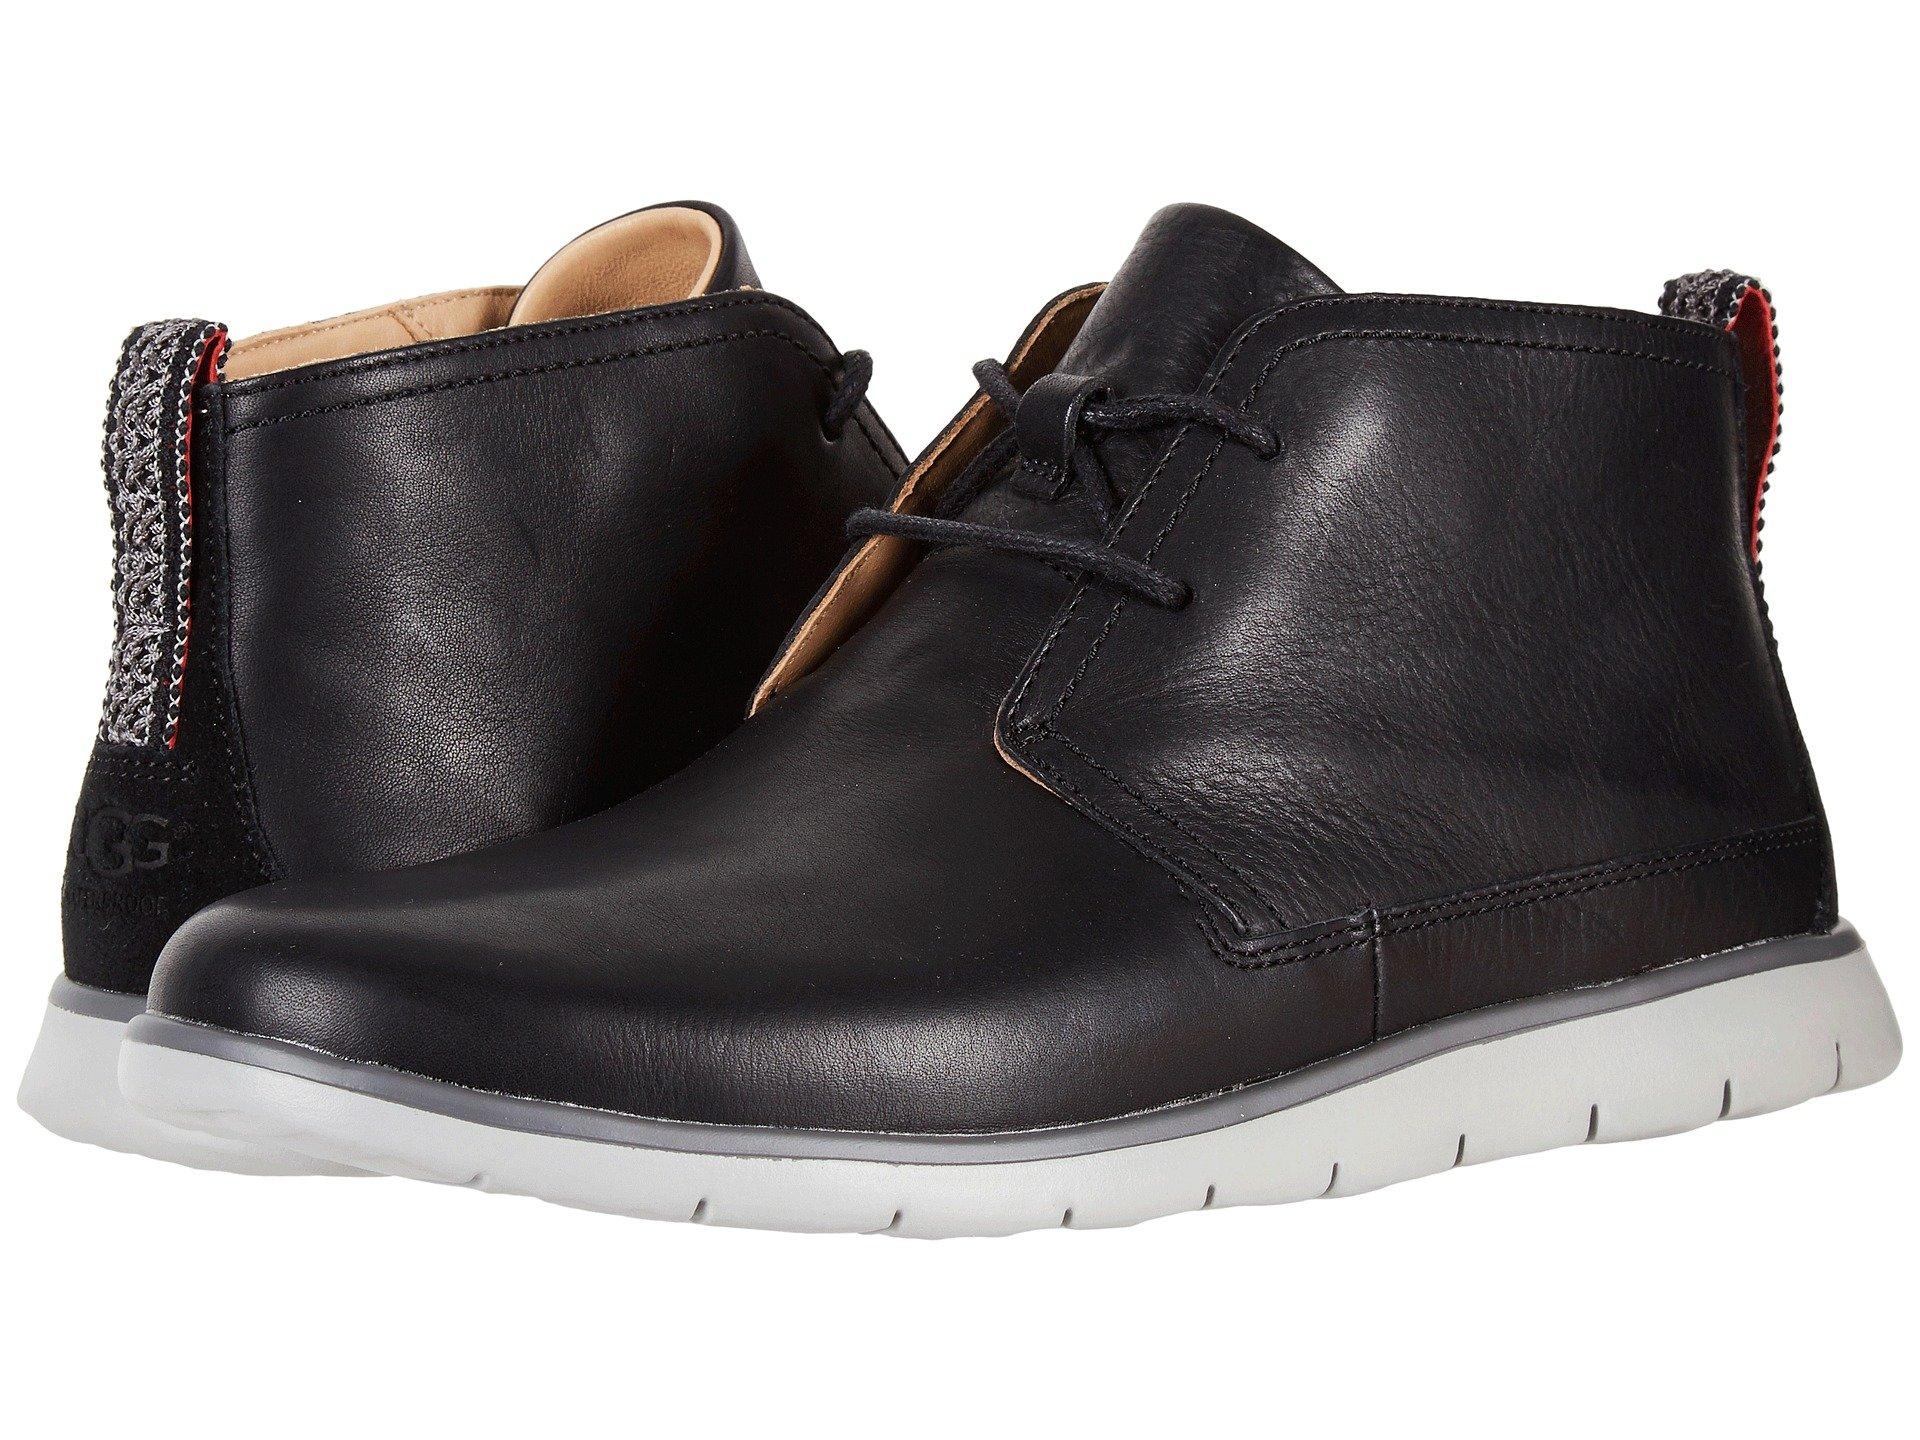 Ugg, Boots, Men | Shipped Free at Zappos